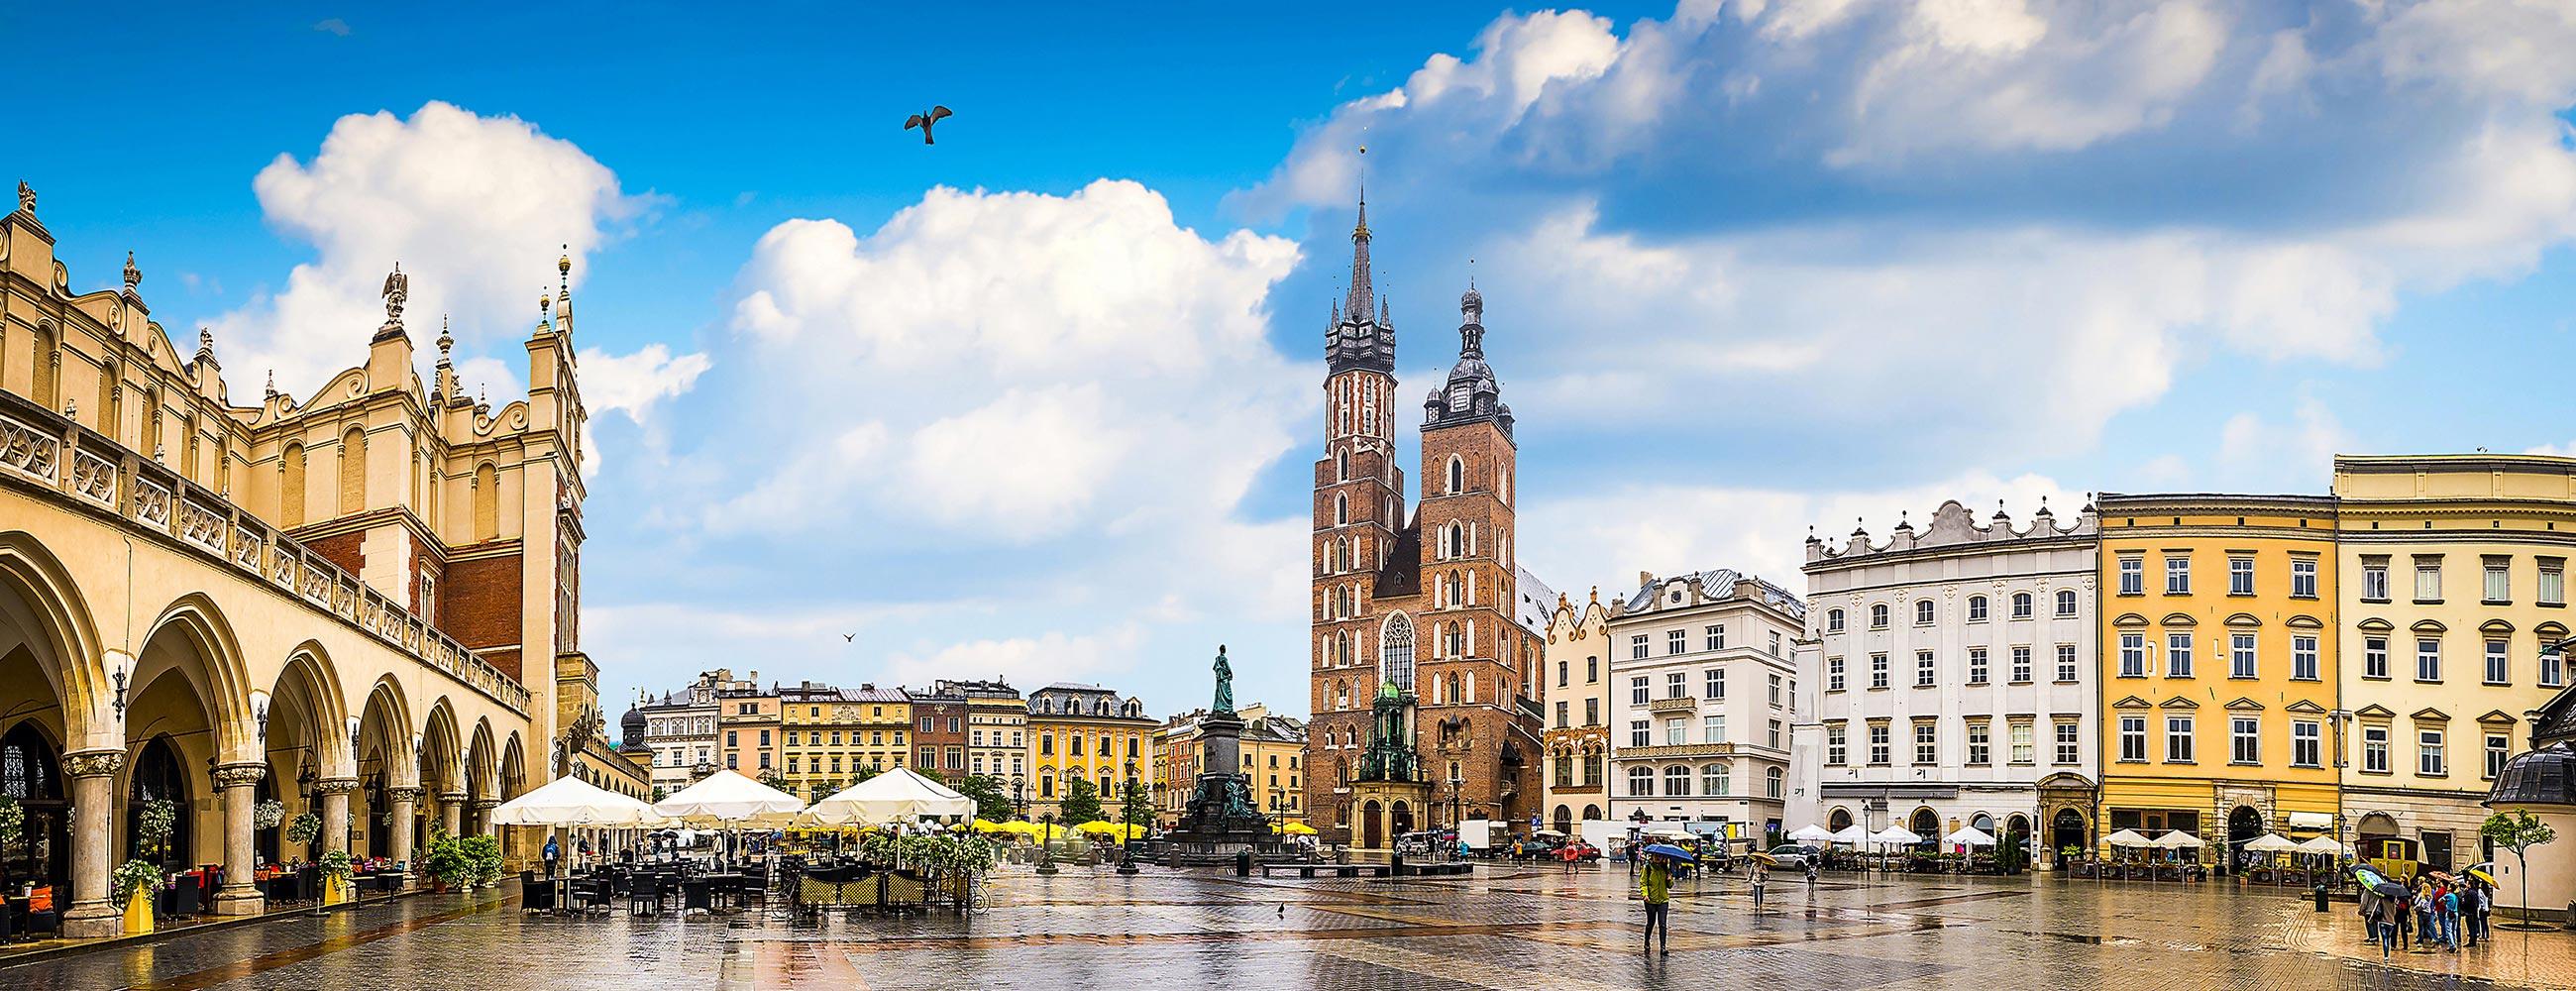 krakow-old-town-hero